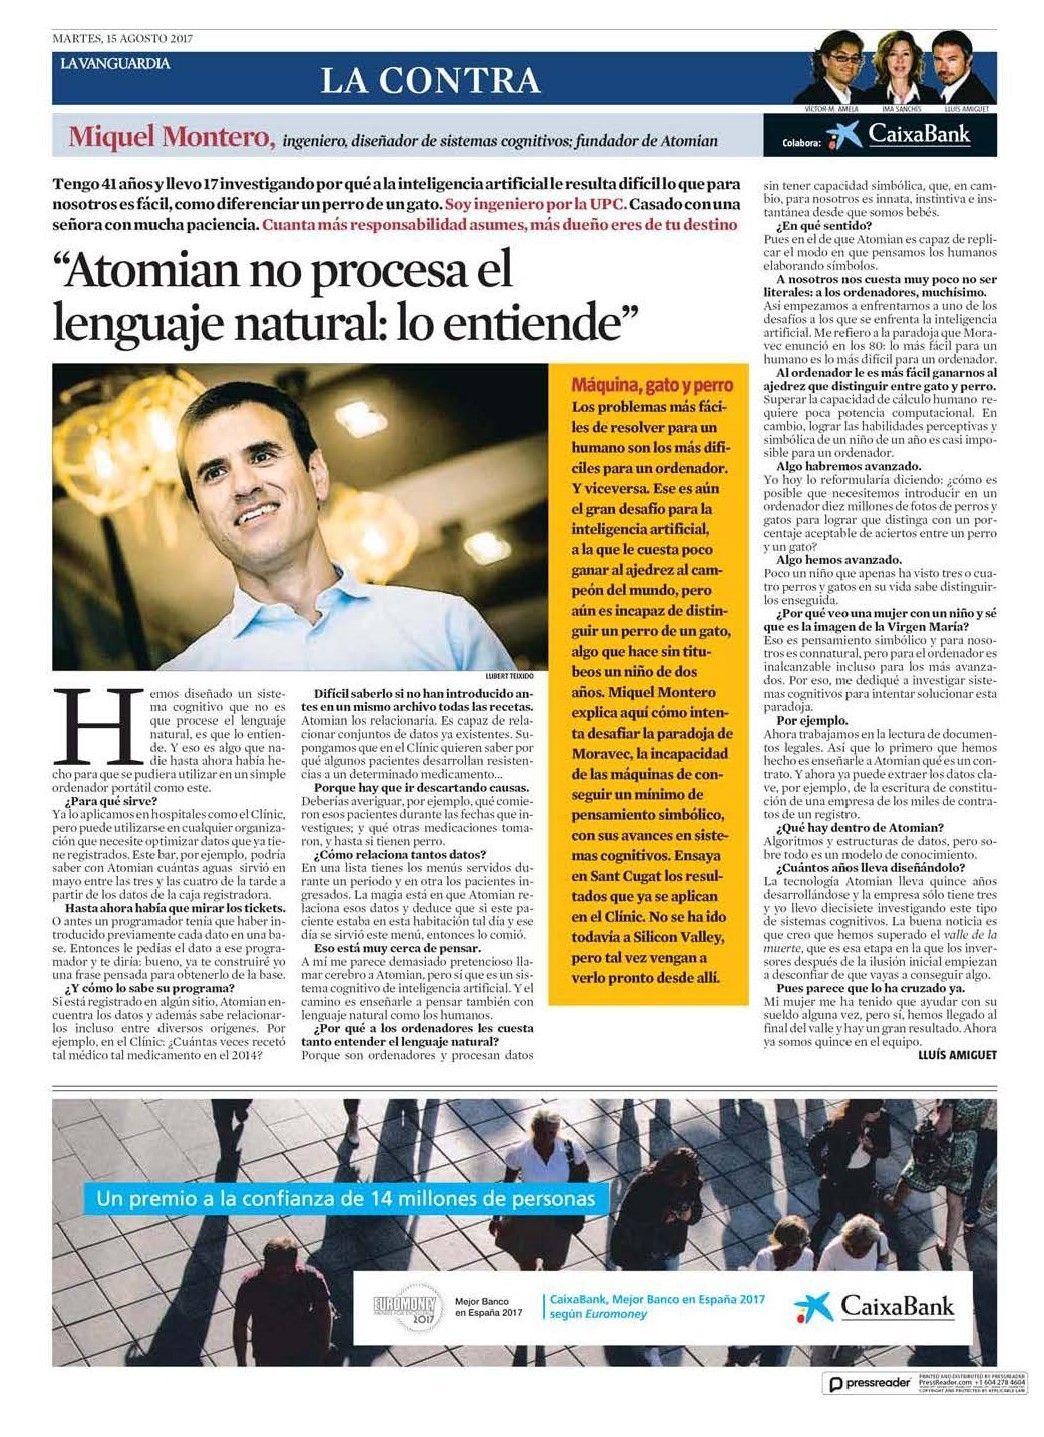 https://whiterabbit.es/wp-content/uploads/2017/08/atomian_vanguardia_contra2.jpg